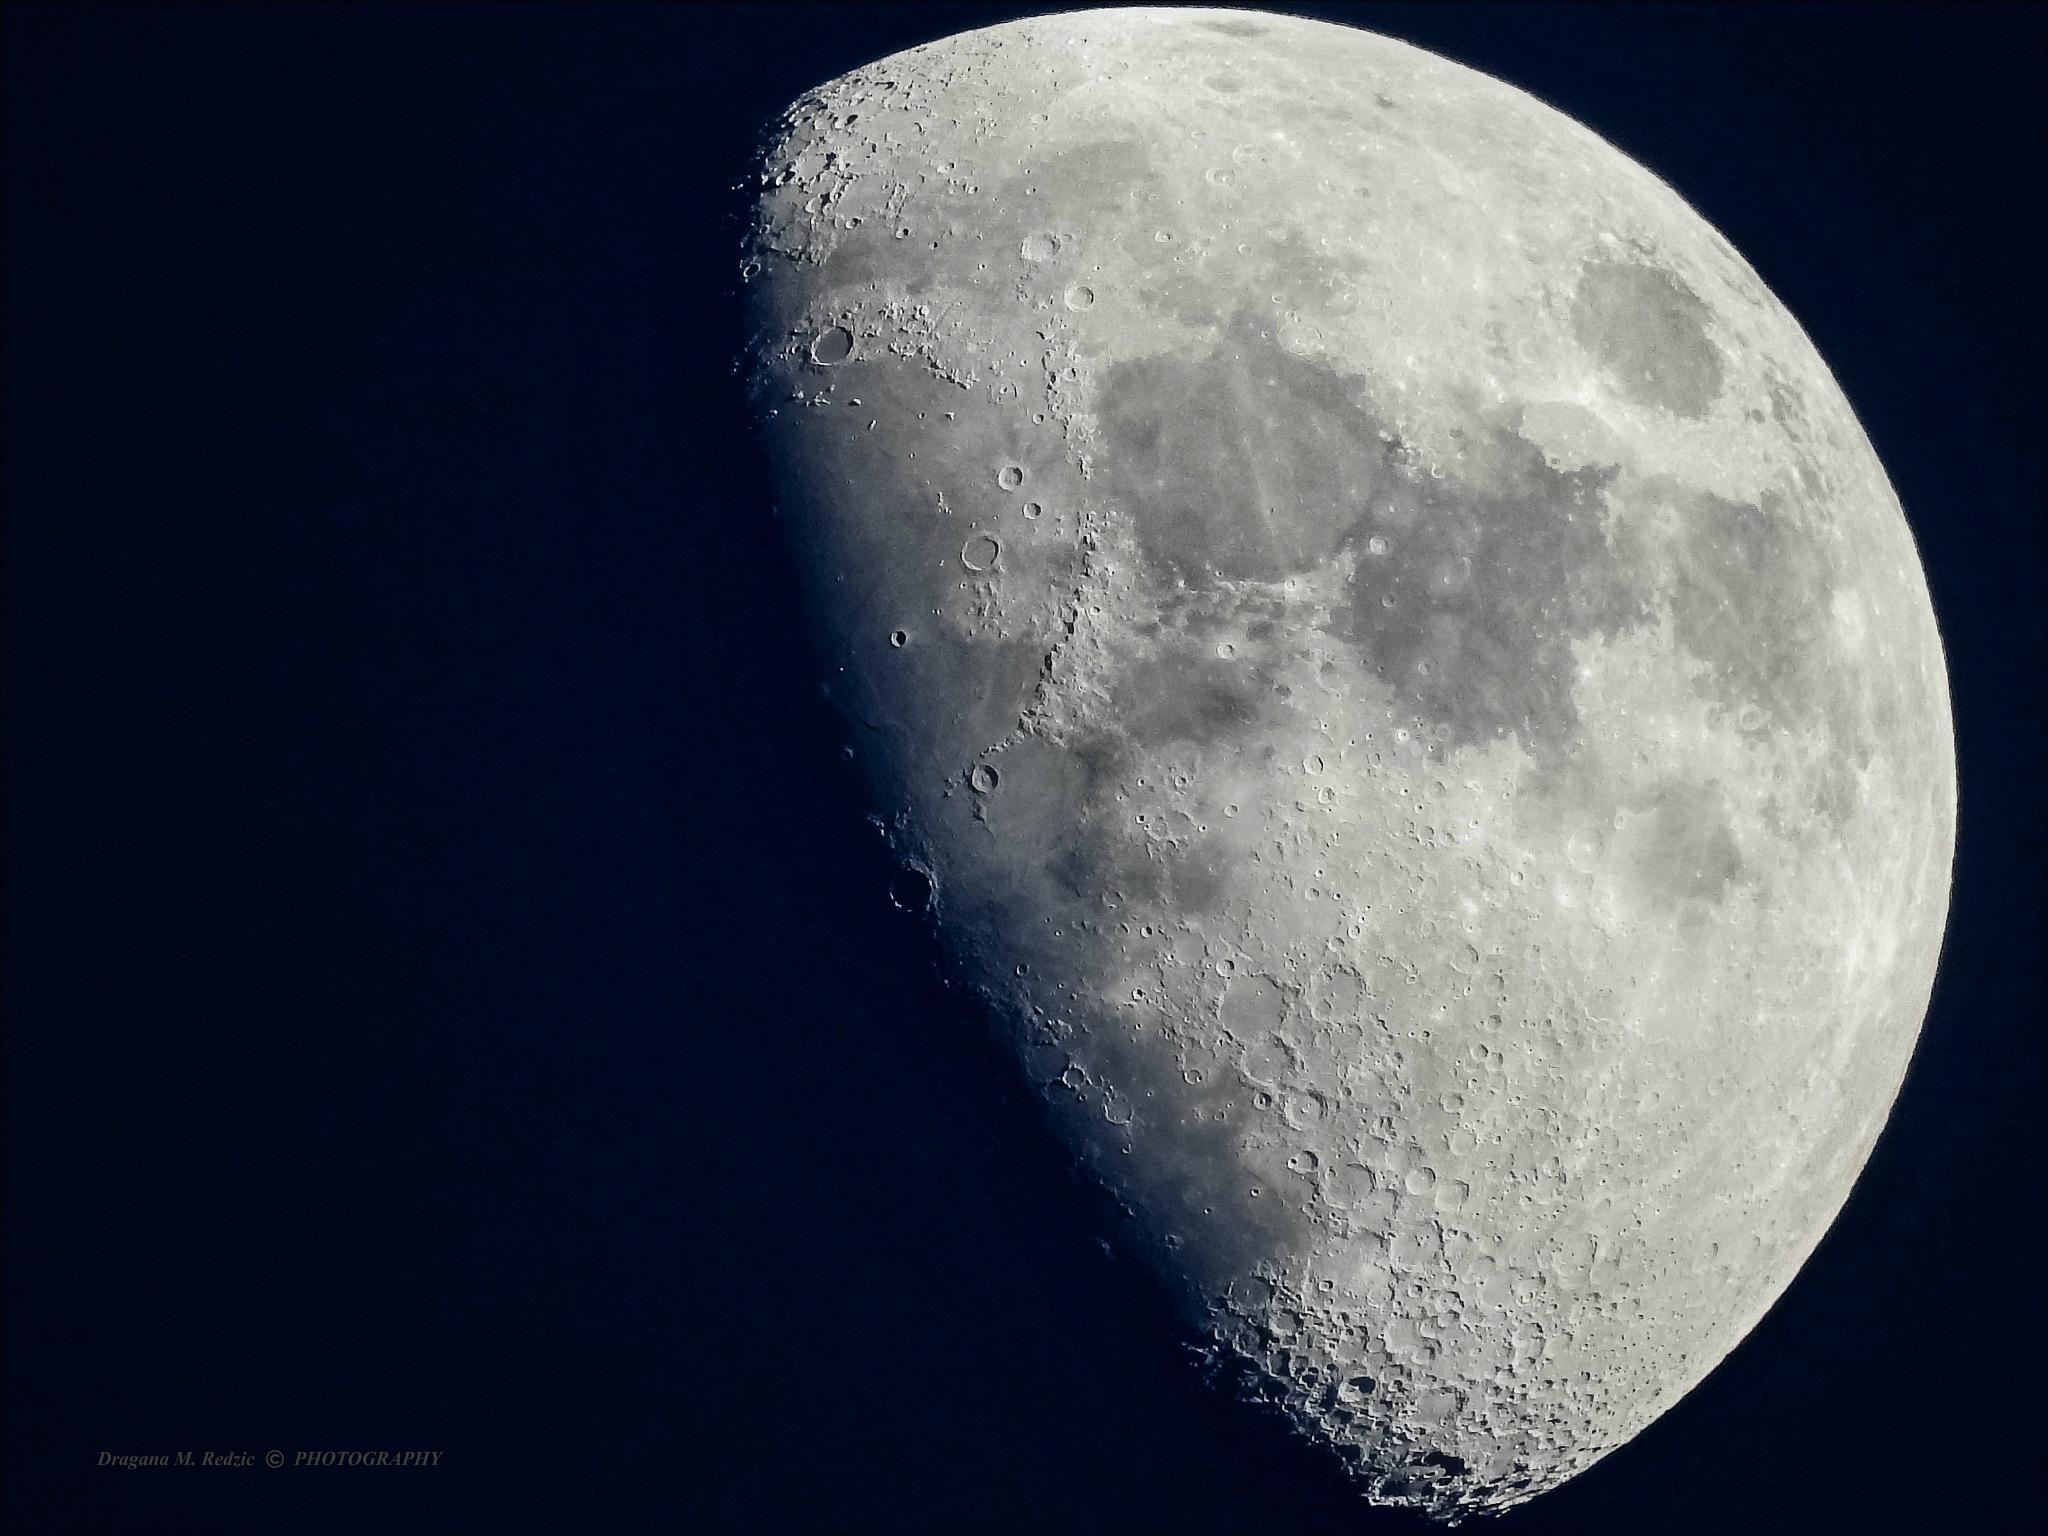 Moon - the night colors by Драгана М. Реџић